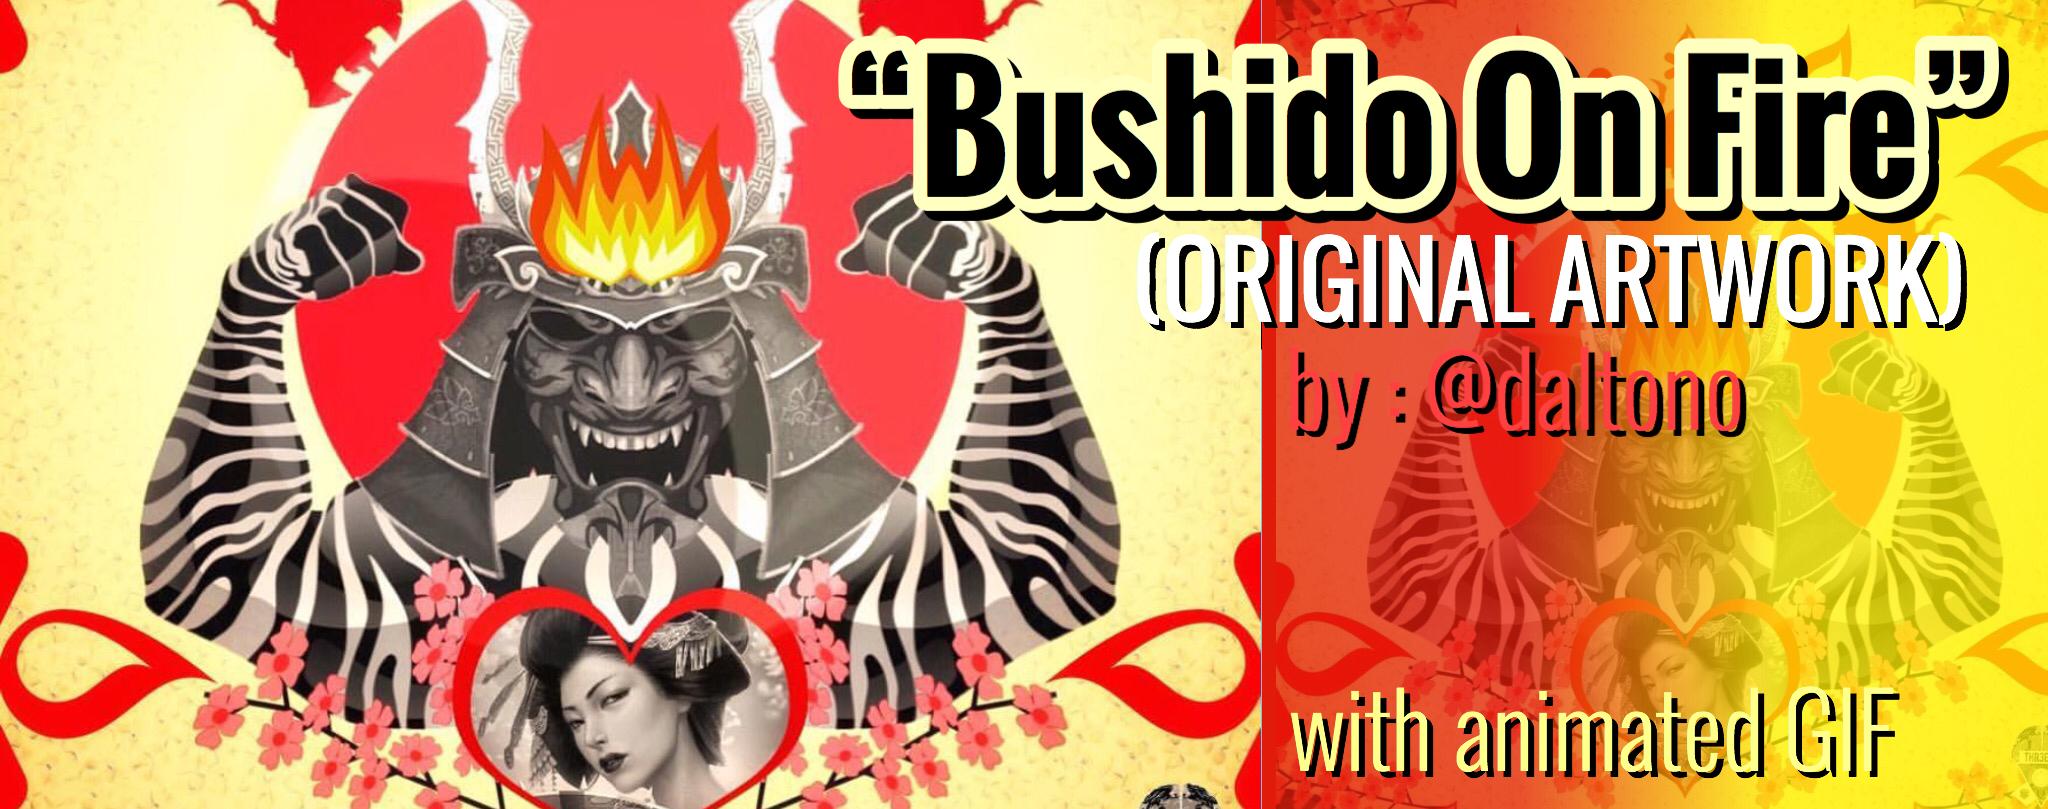 bushido-on-fire-thumbnail.JPG